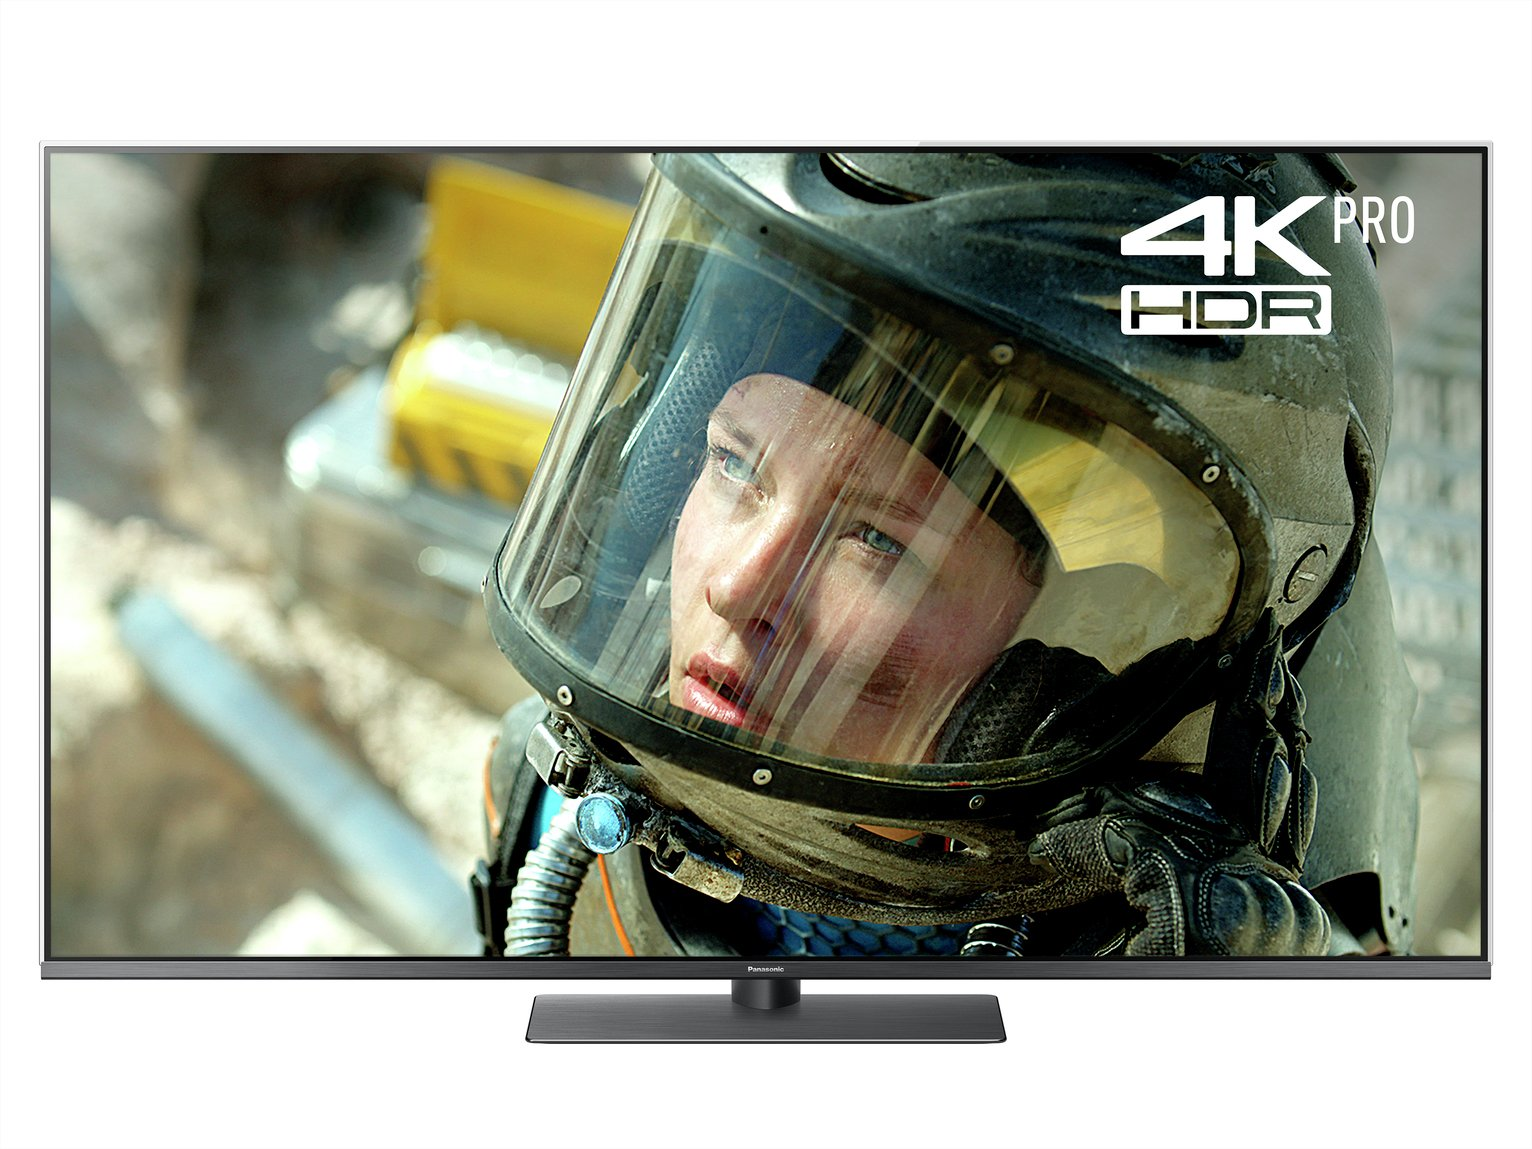 Panasonic Panasonic 55 Inch TX-55FX750B Smart 4K UHD TV with HDR